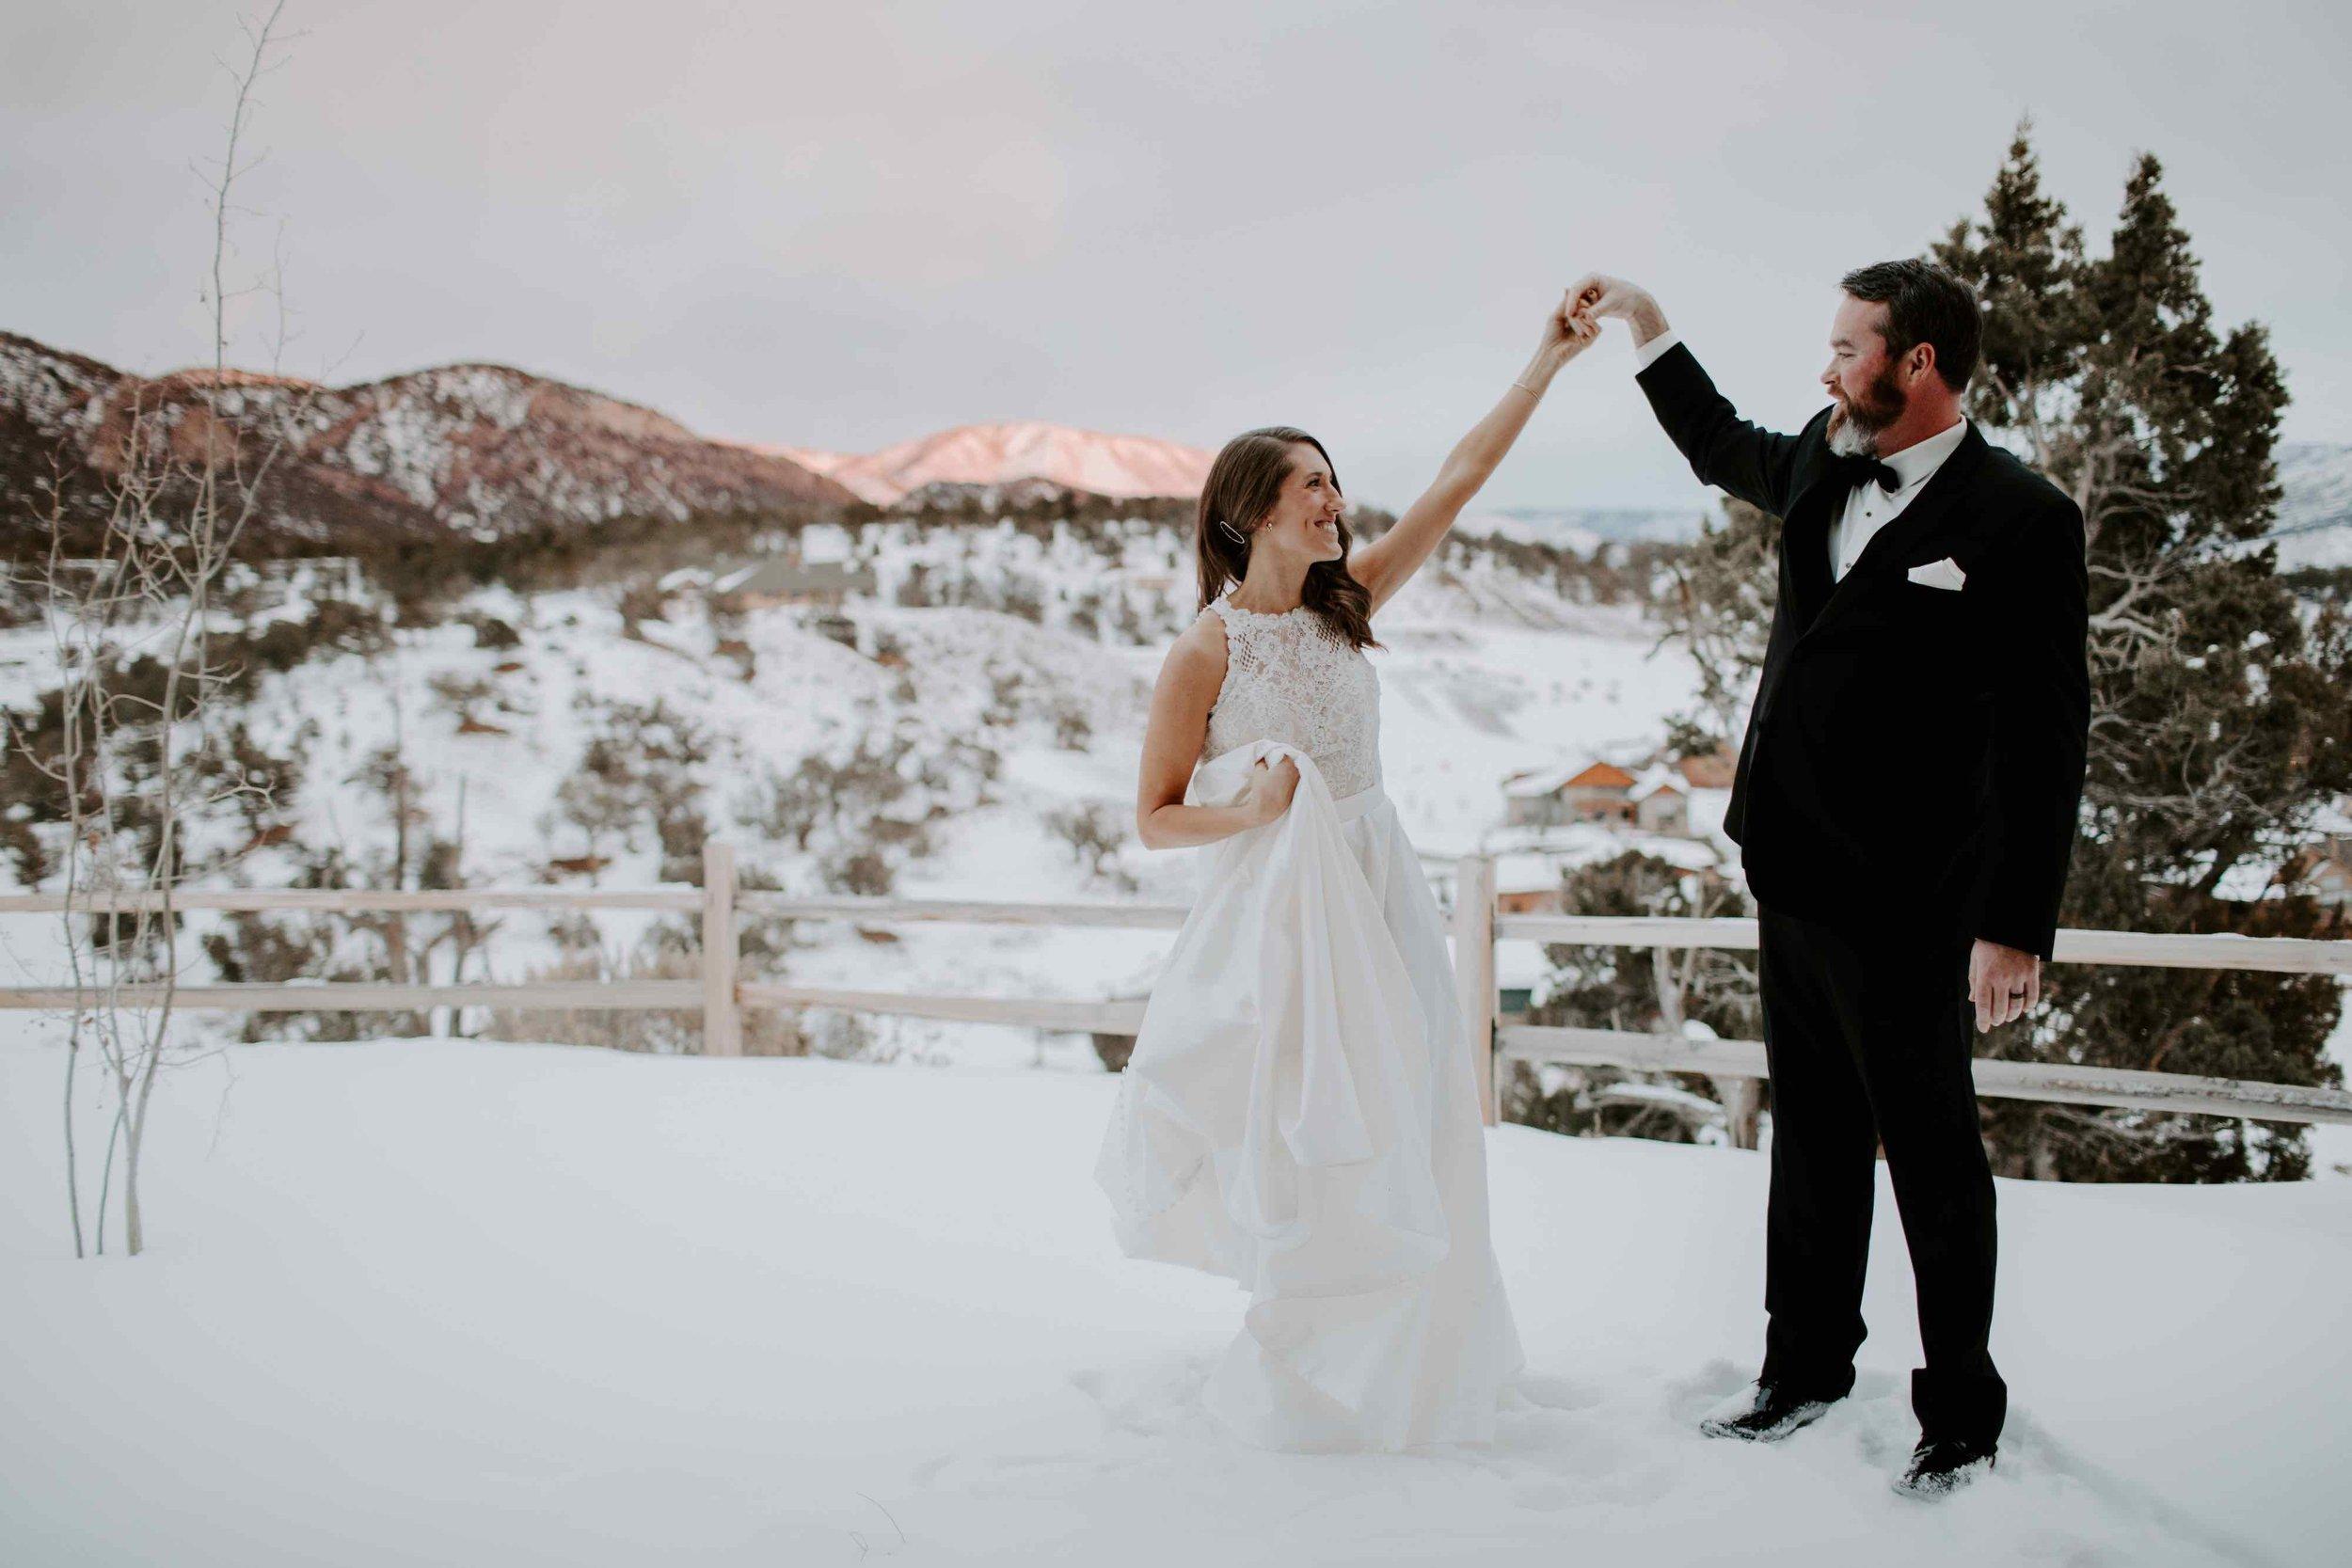 Kisa Conrad Favorites-0042-colorado-wedding-photographer-denver-springs-vailhotel-glenwood-springs-colorado-wedding-photographer.jpeg